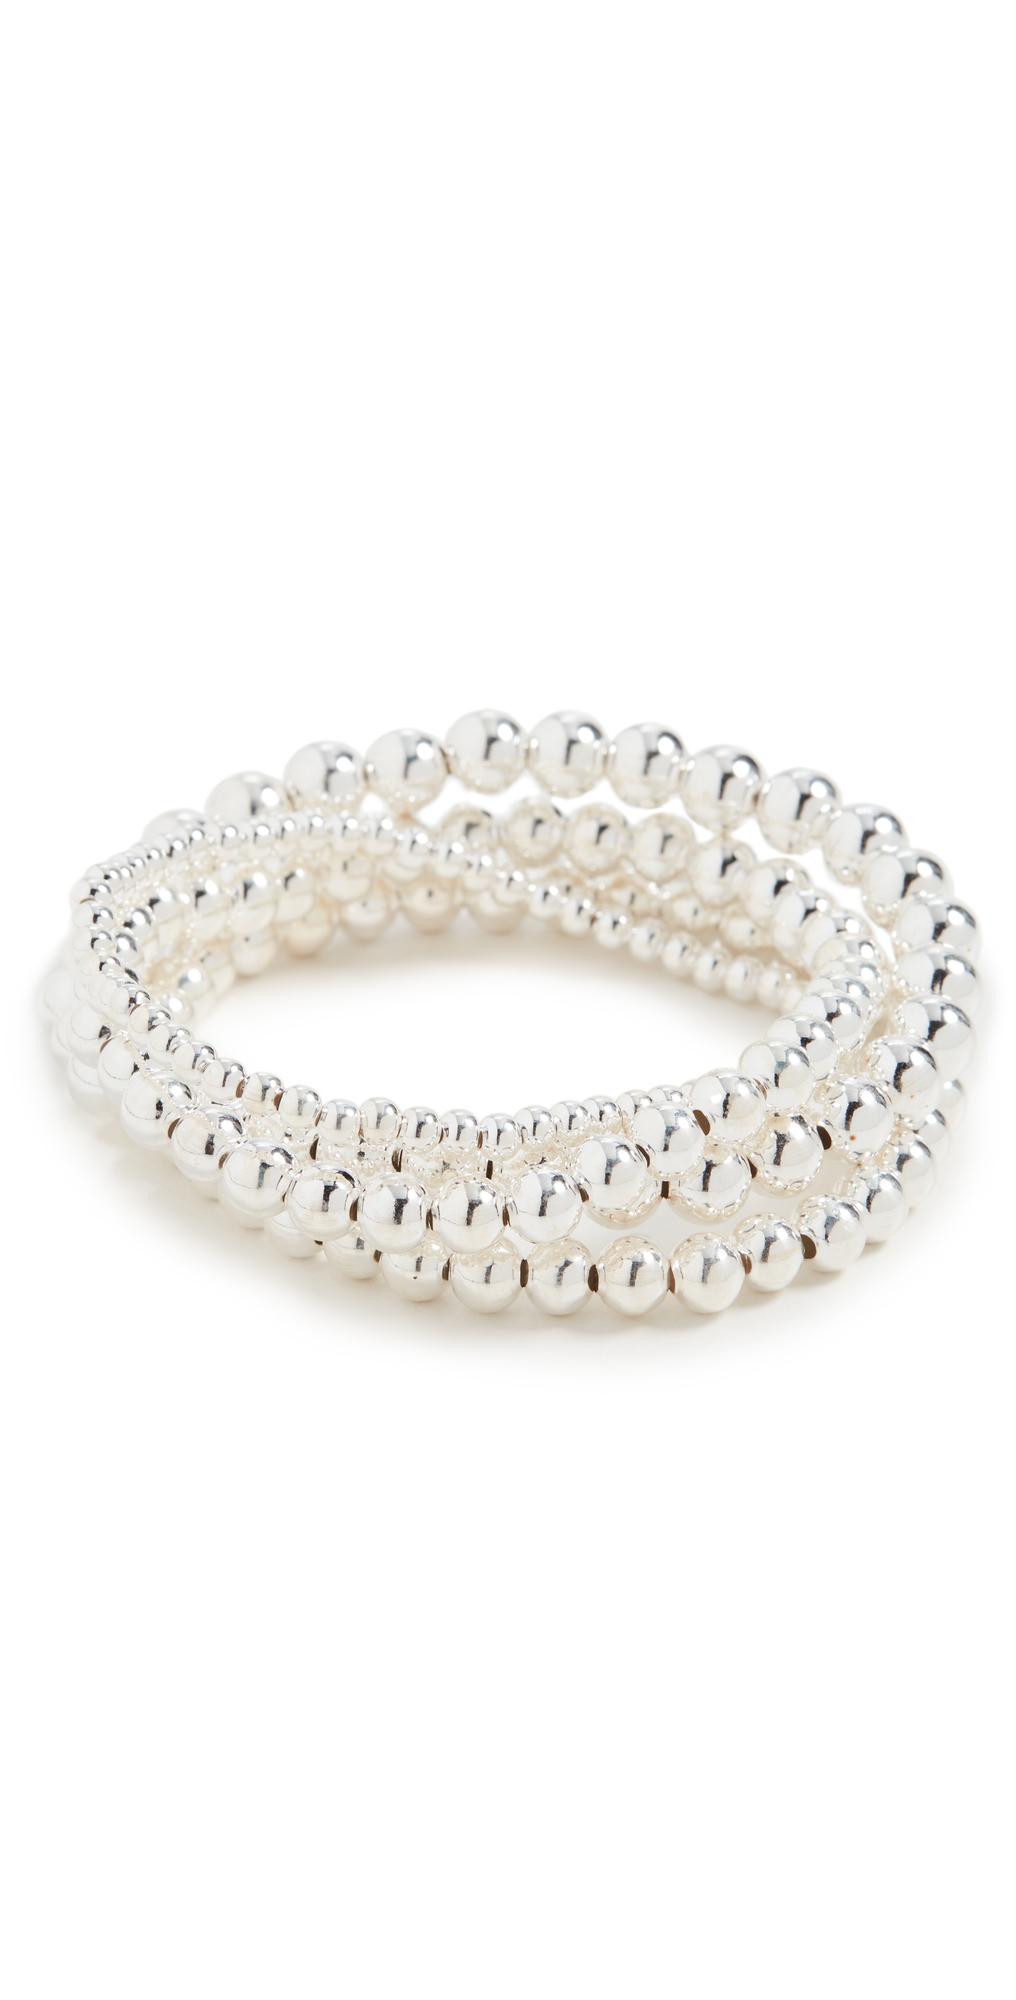 Sterling Silver Foursome Bracelets